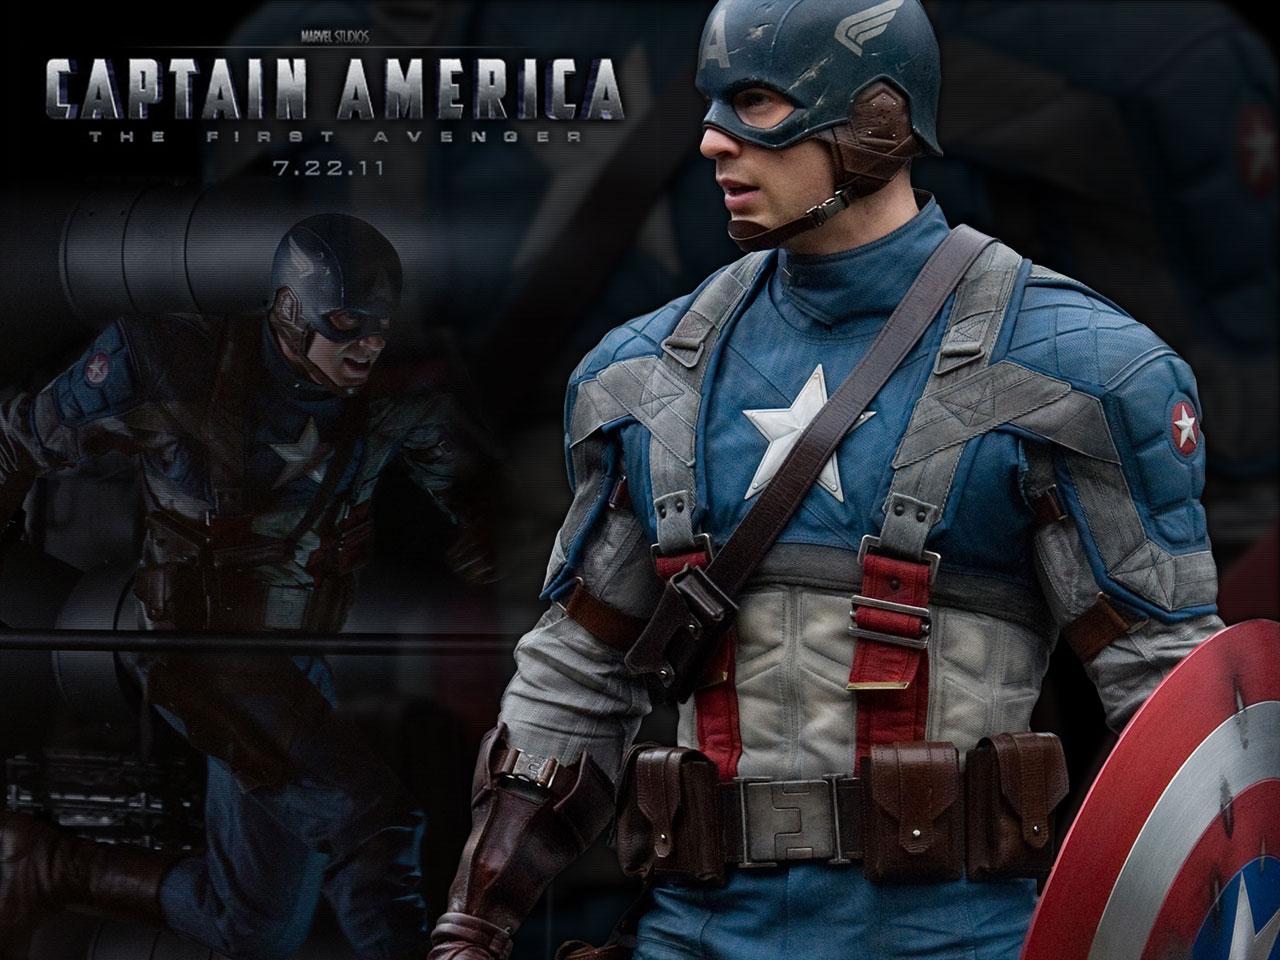 http://2.bp.blogspot.com/-QNBgVvNpBlQ/TimrOqxGWHI/AAAAAAAACUs/yh4asDhJd8E/s1600/Captain_America_Movie_Poster_Wallpaper_3.jpg